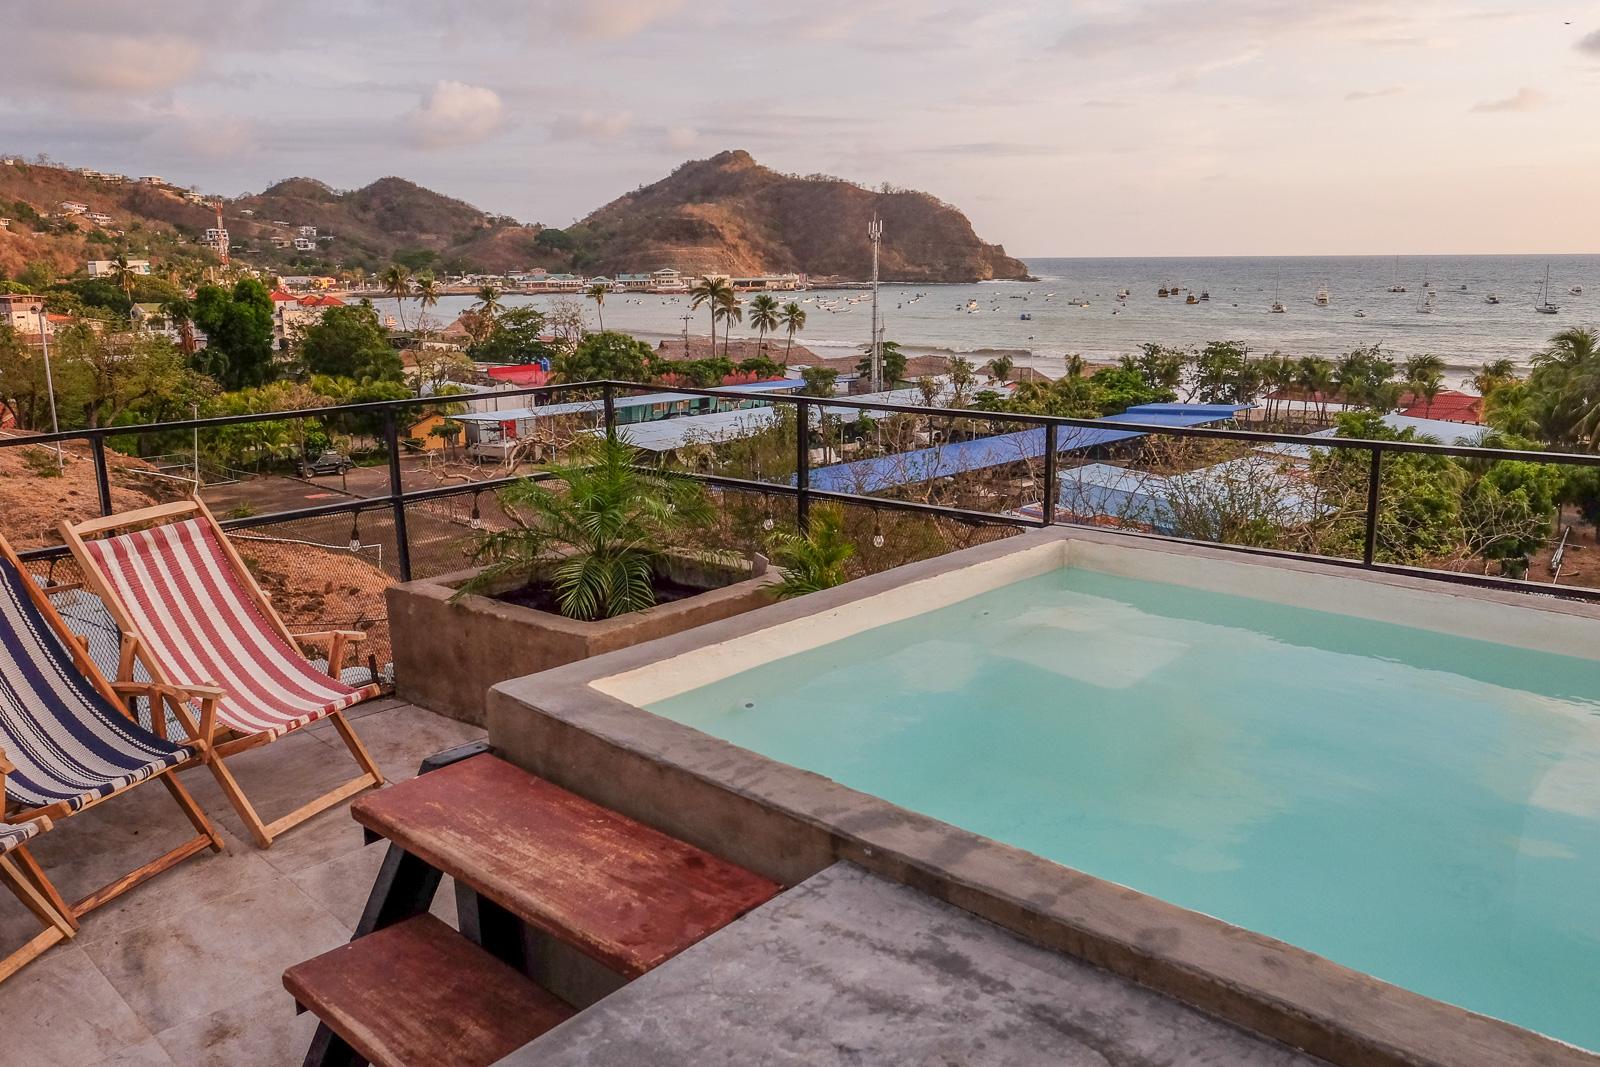 Property for sale in San Juan Del Sur Nicaragua, Social House 20.jpg